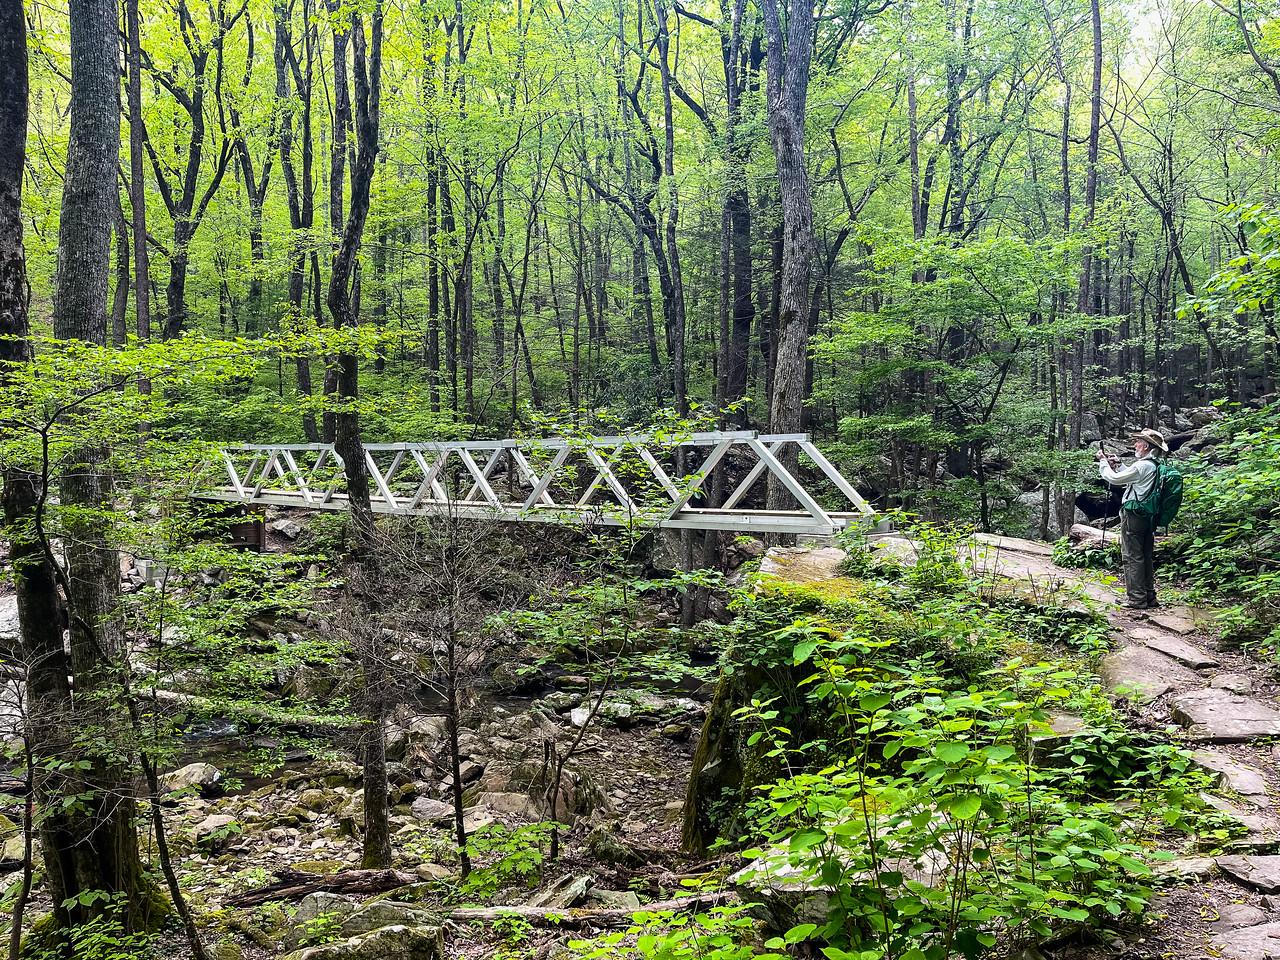 A large metal bridge crossing a creek.